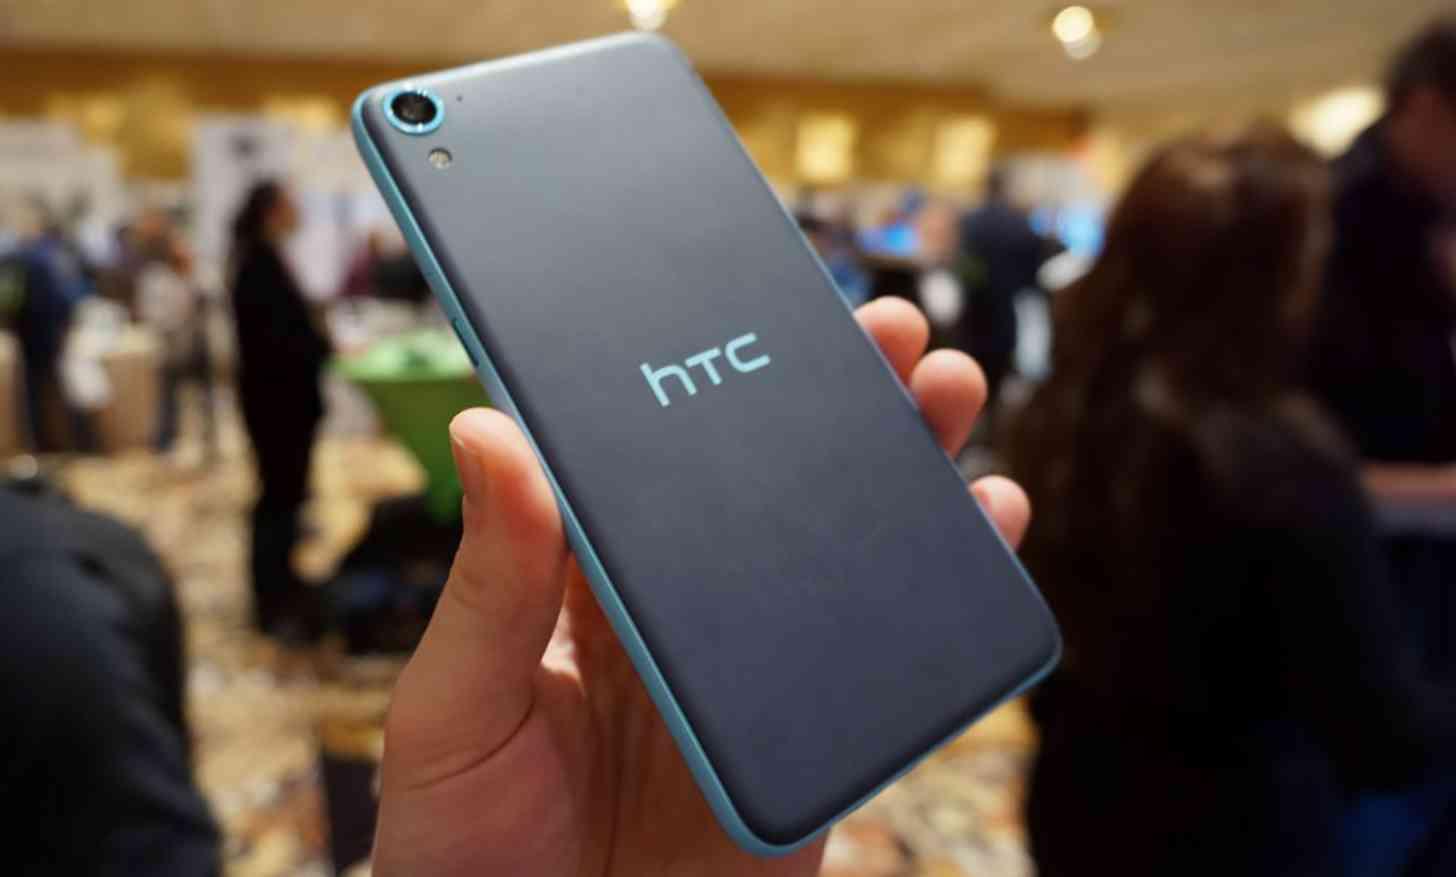 HTC Desire 826 hands on